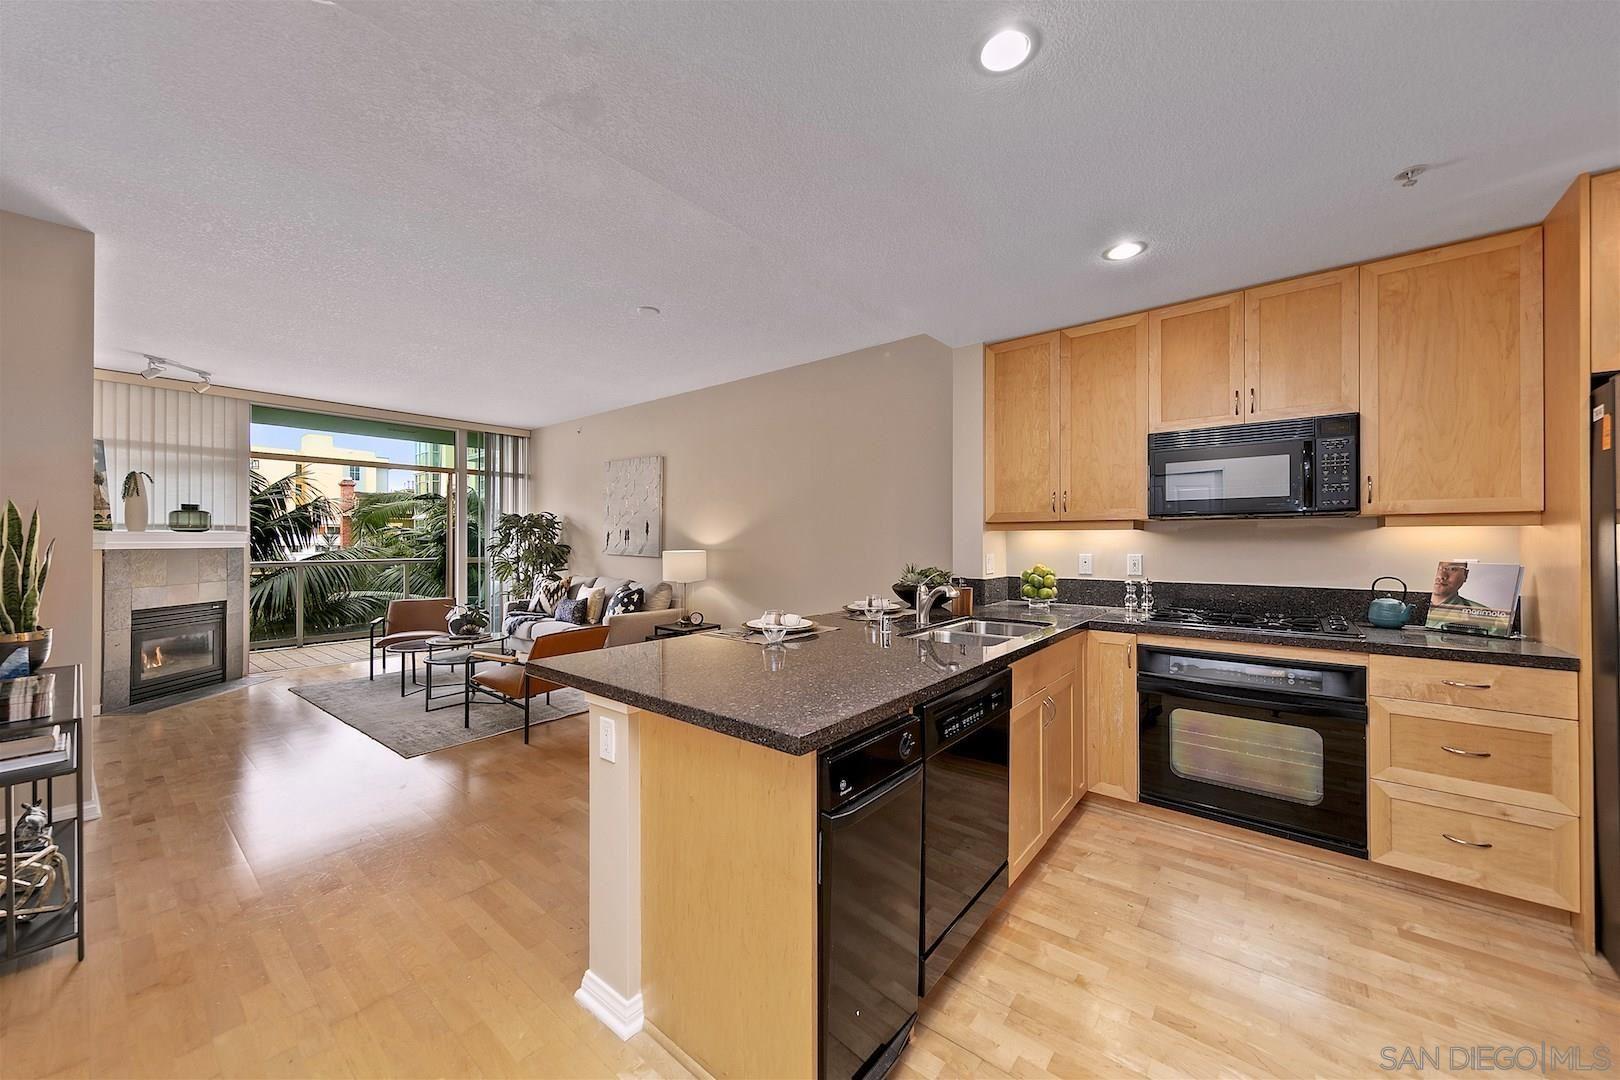 Photo for 850 Beech Street #518, San Diego, CA 92101 (MLS # 210003884)